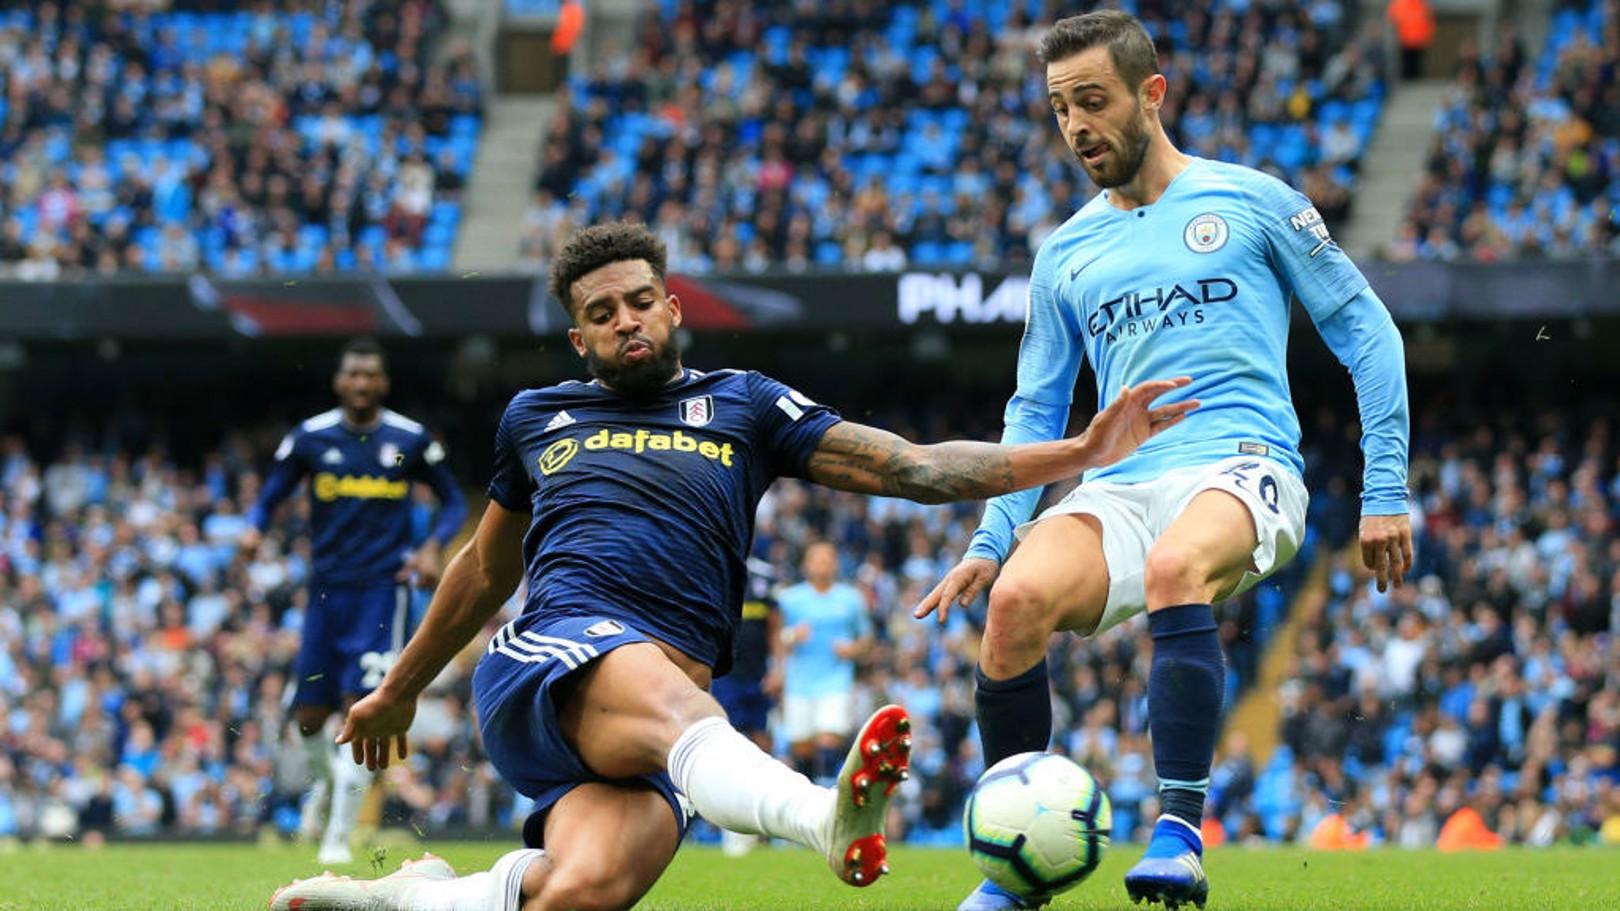 EYE CATCHER: Bernardo Silva was at his bewitching best against Fulham